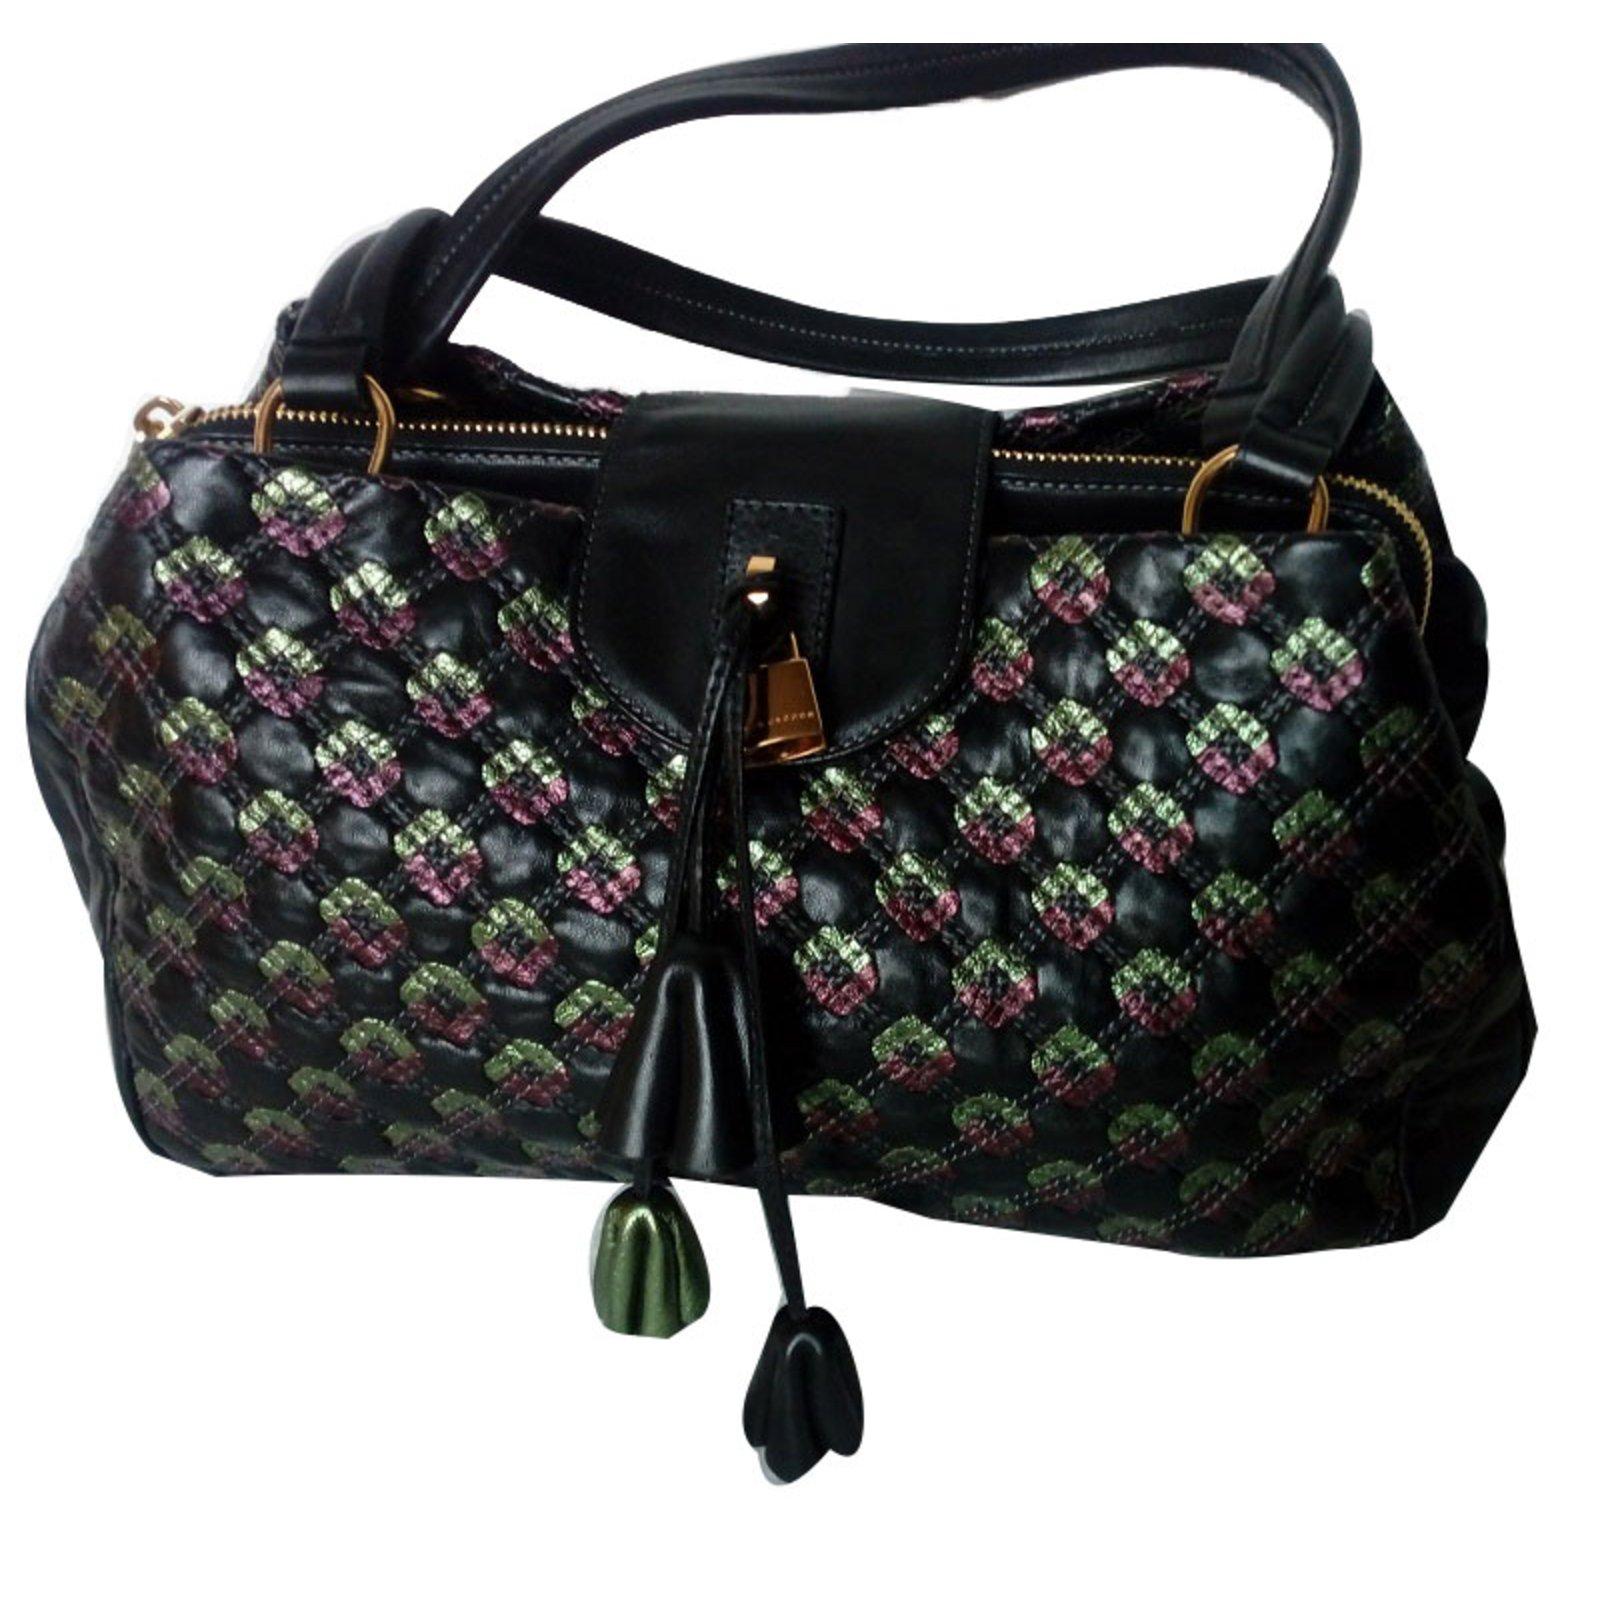 Marc Jacobs Handbags Lambskin Black Ref 80013